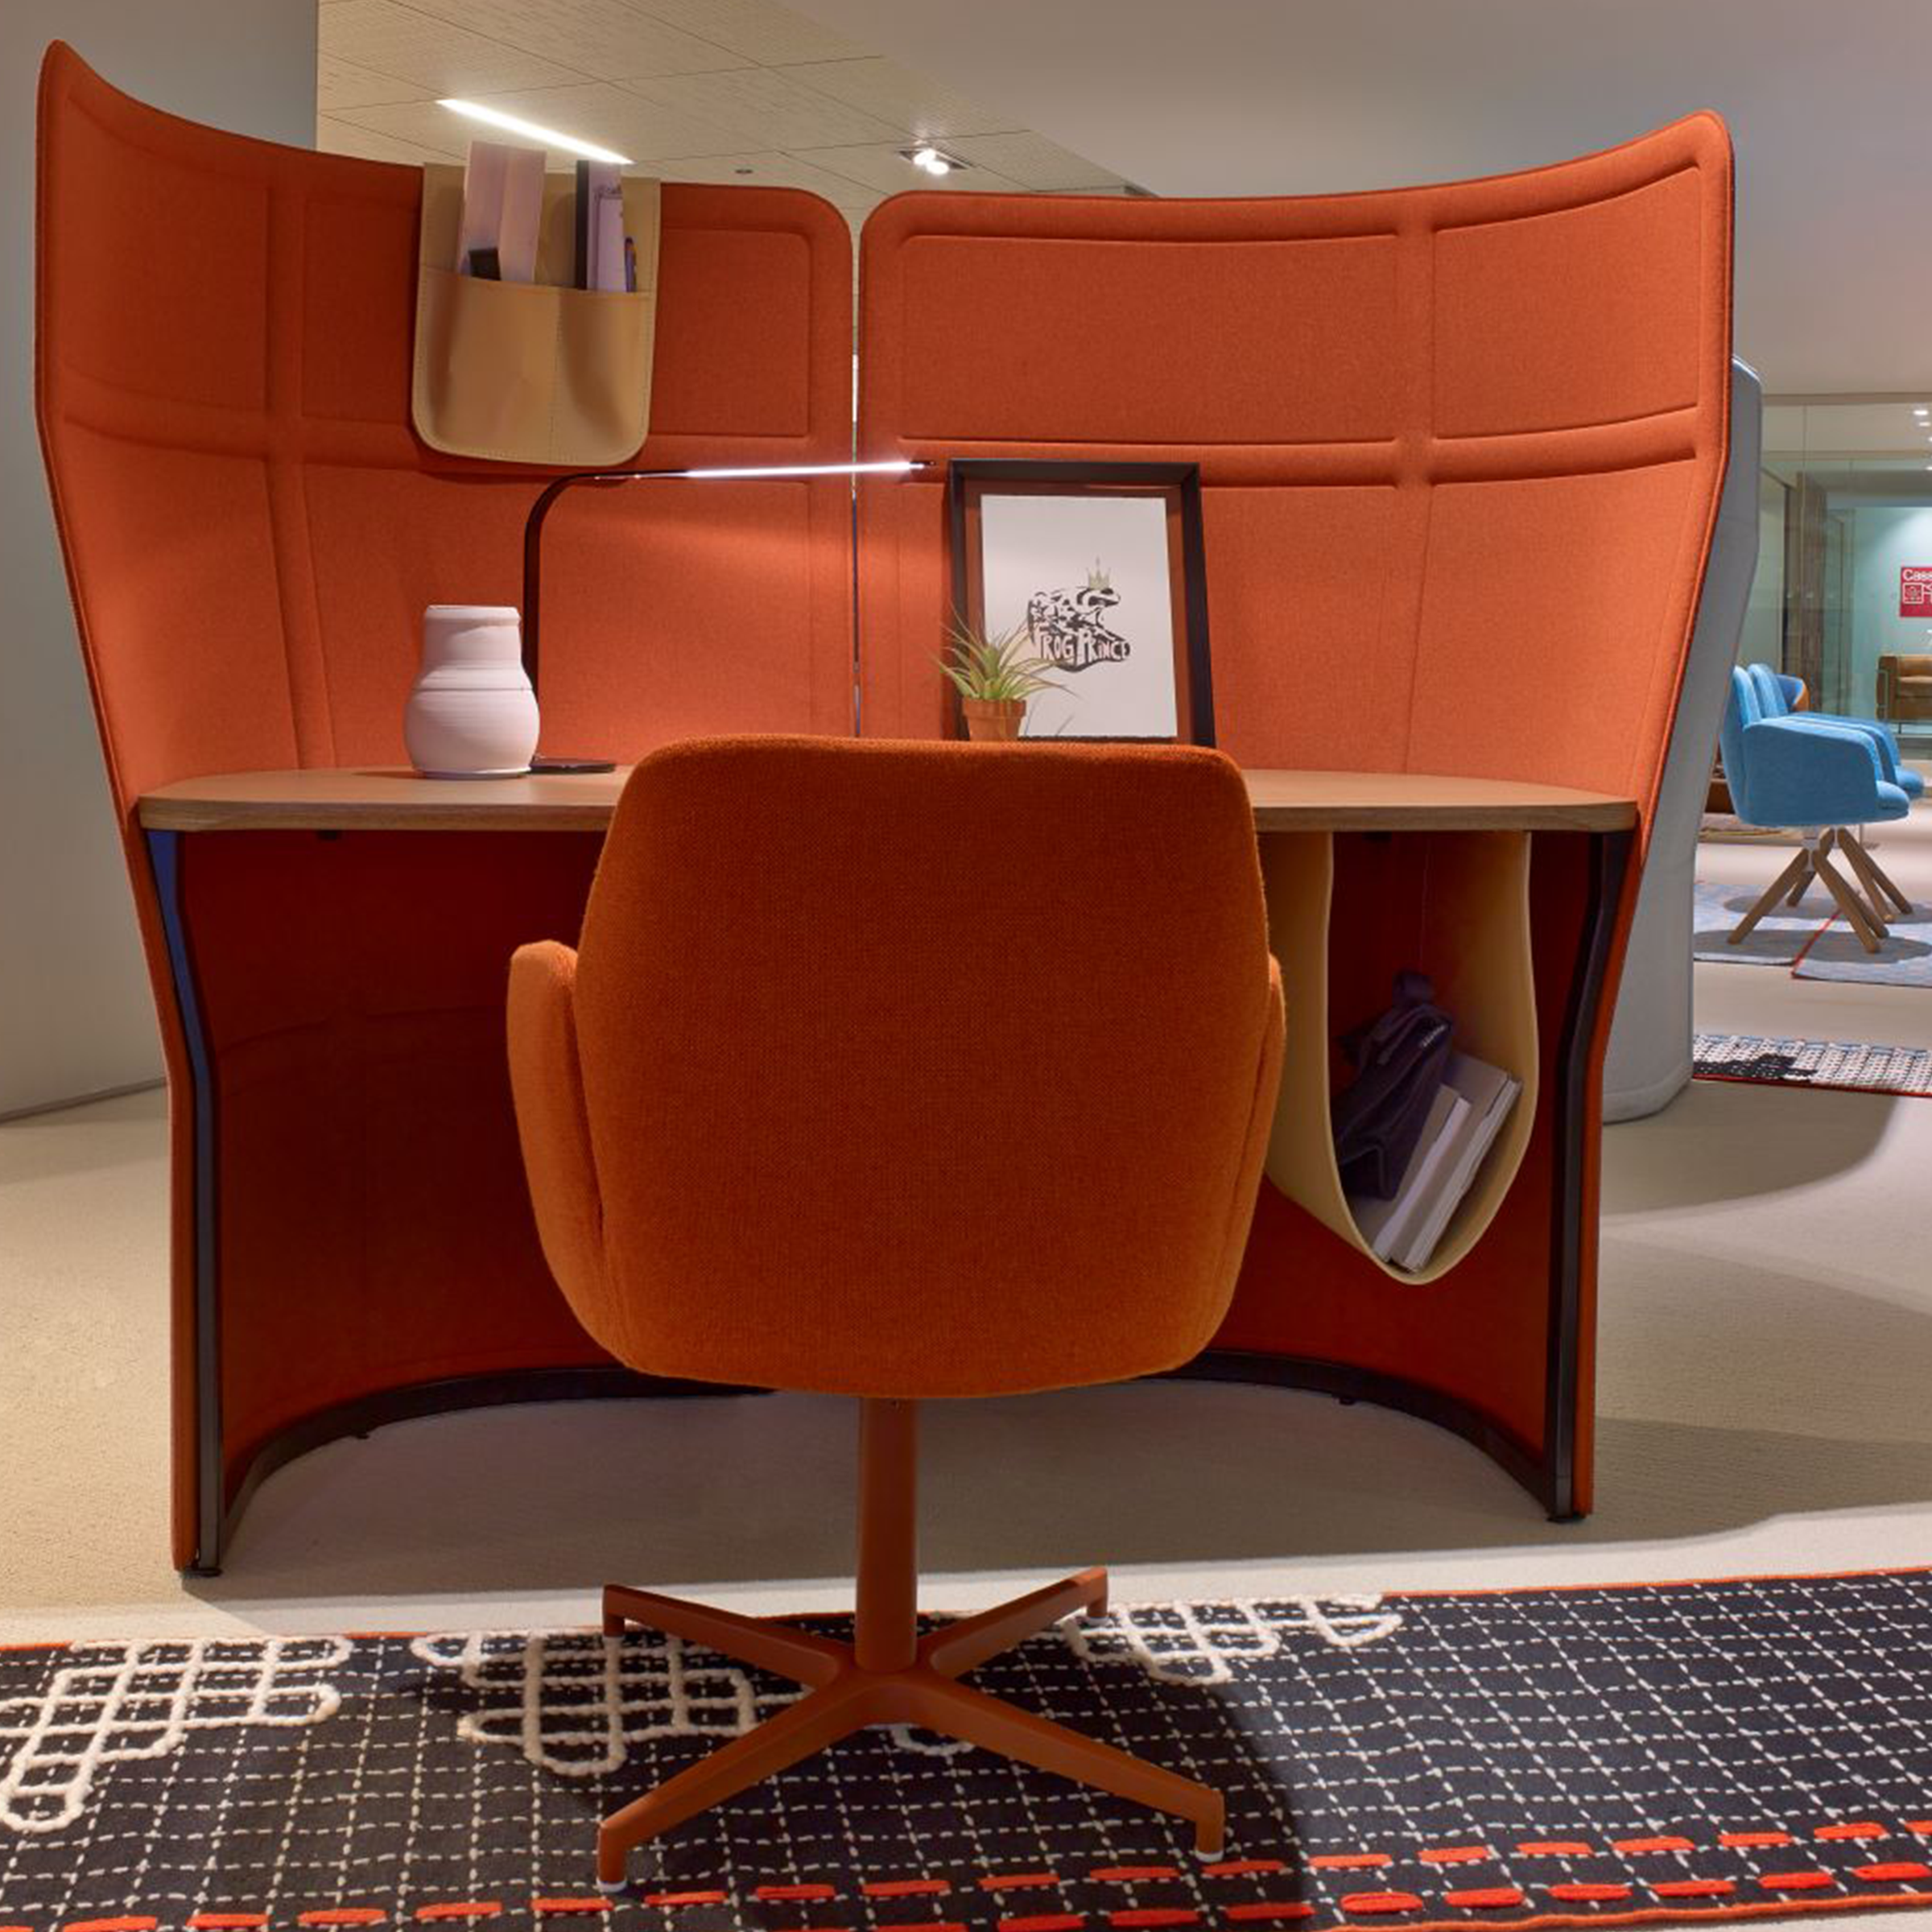 Image Result For Bedroom Seating Furniture